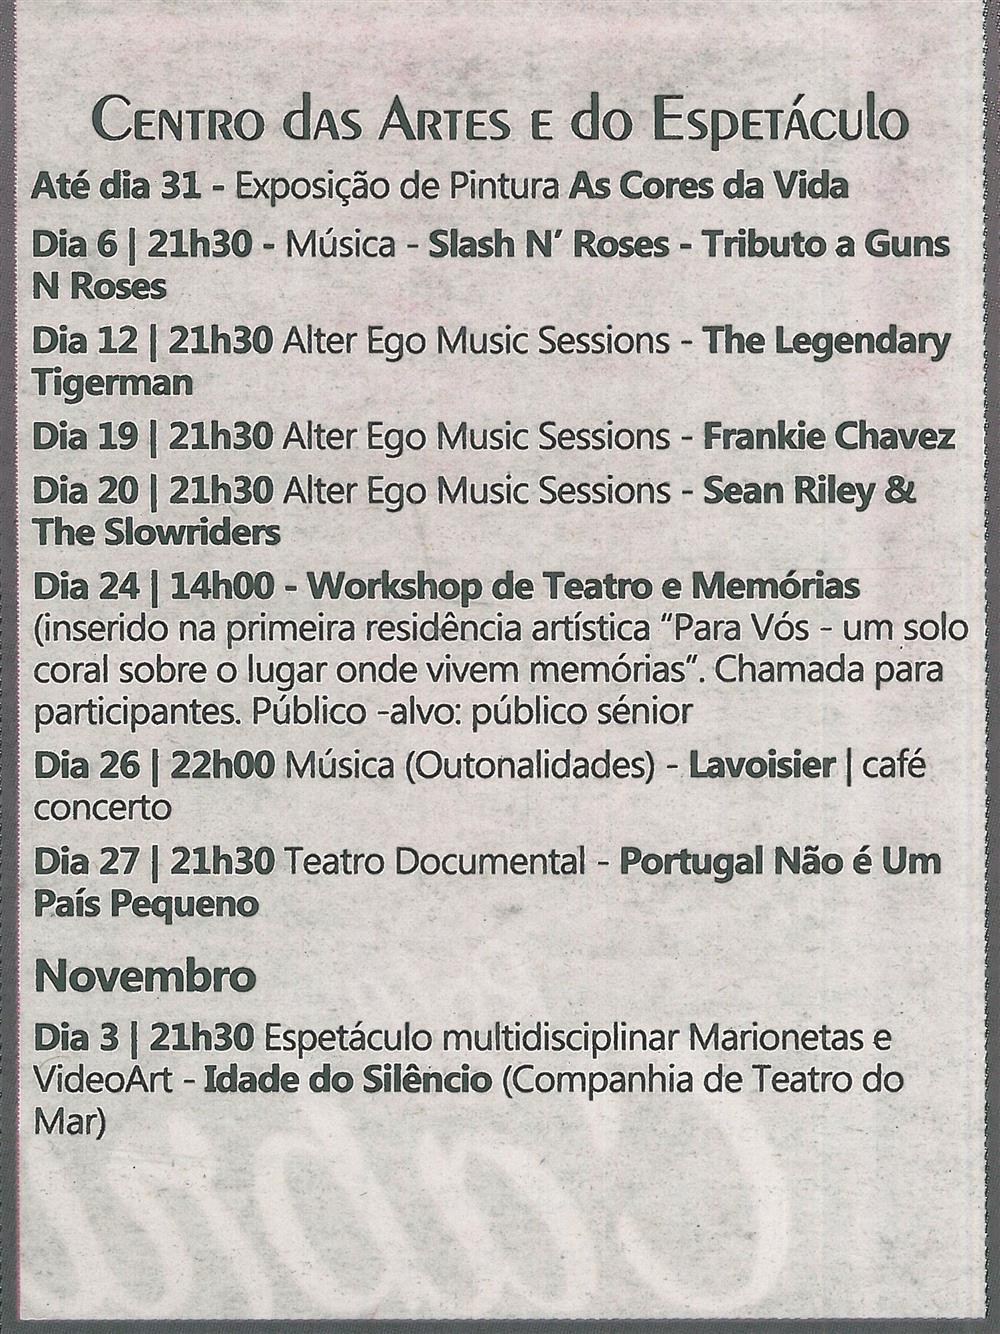 TV-out.'18-p.19-Agenda Cultural [de] outubro : Centro das Artes e do Espetáculo.jpg